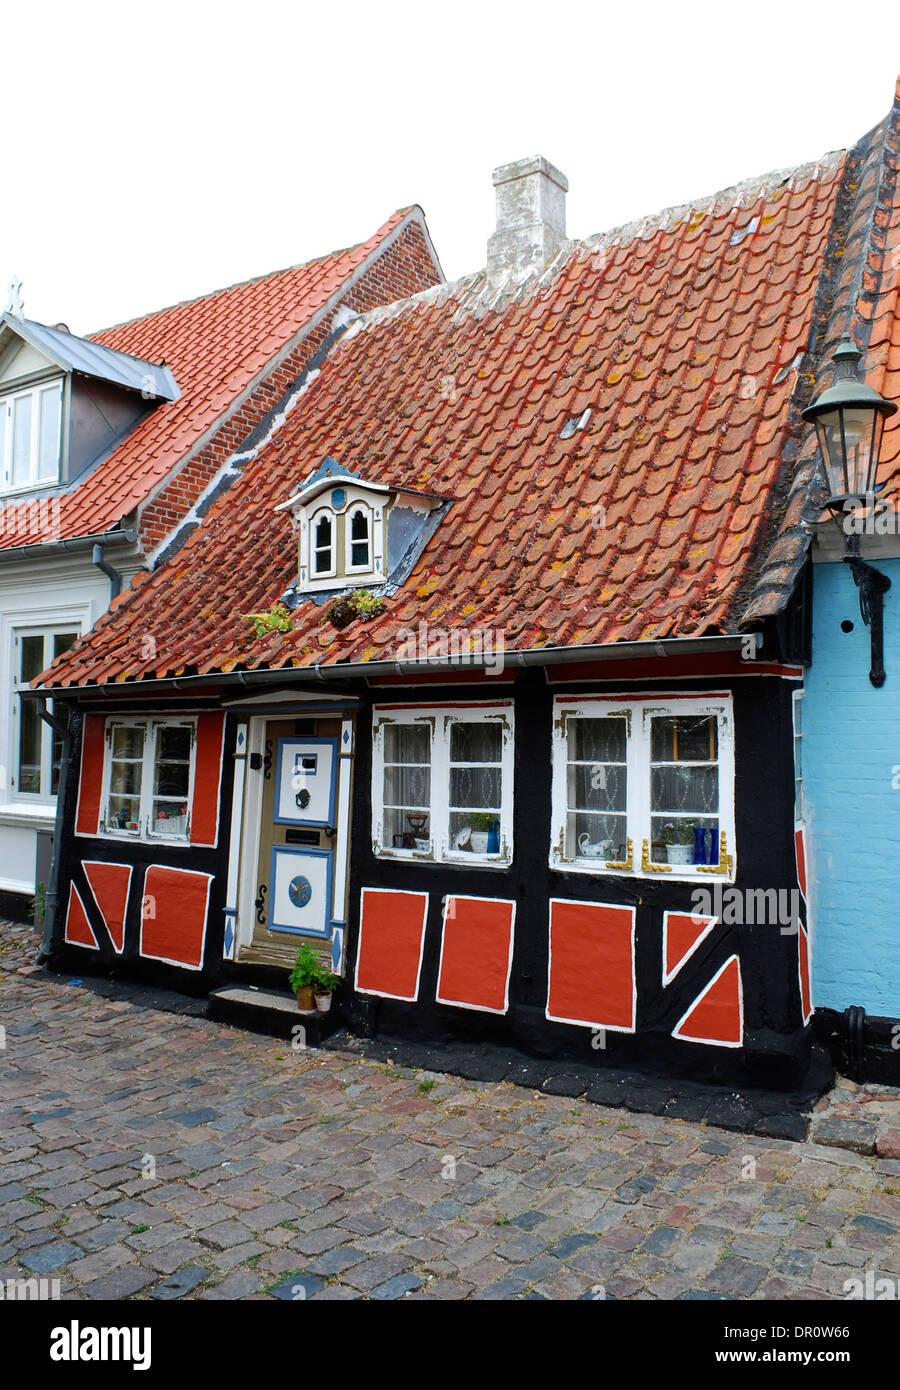 Aero island, Aeroskobing,  house at Smedegade, fyn, Denmark, Scandinavia, Europe - Stock Image